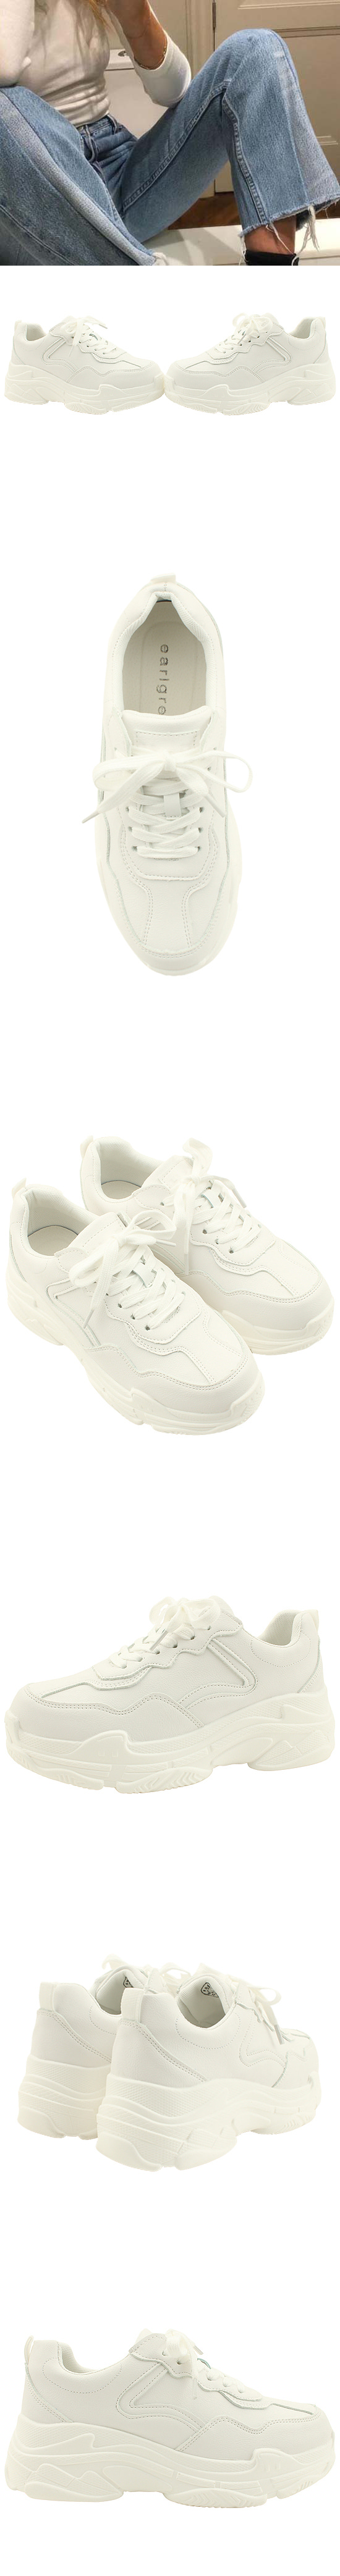 Ugly Shoes High Heel Sneakers 5cm